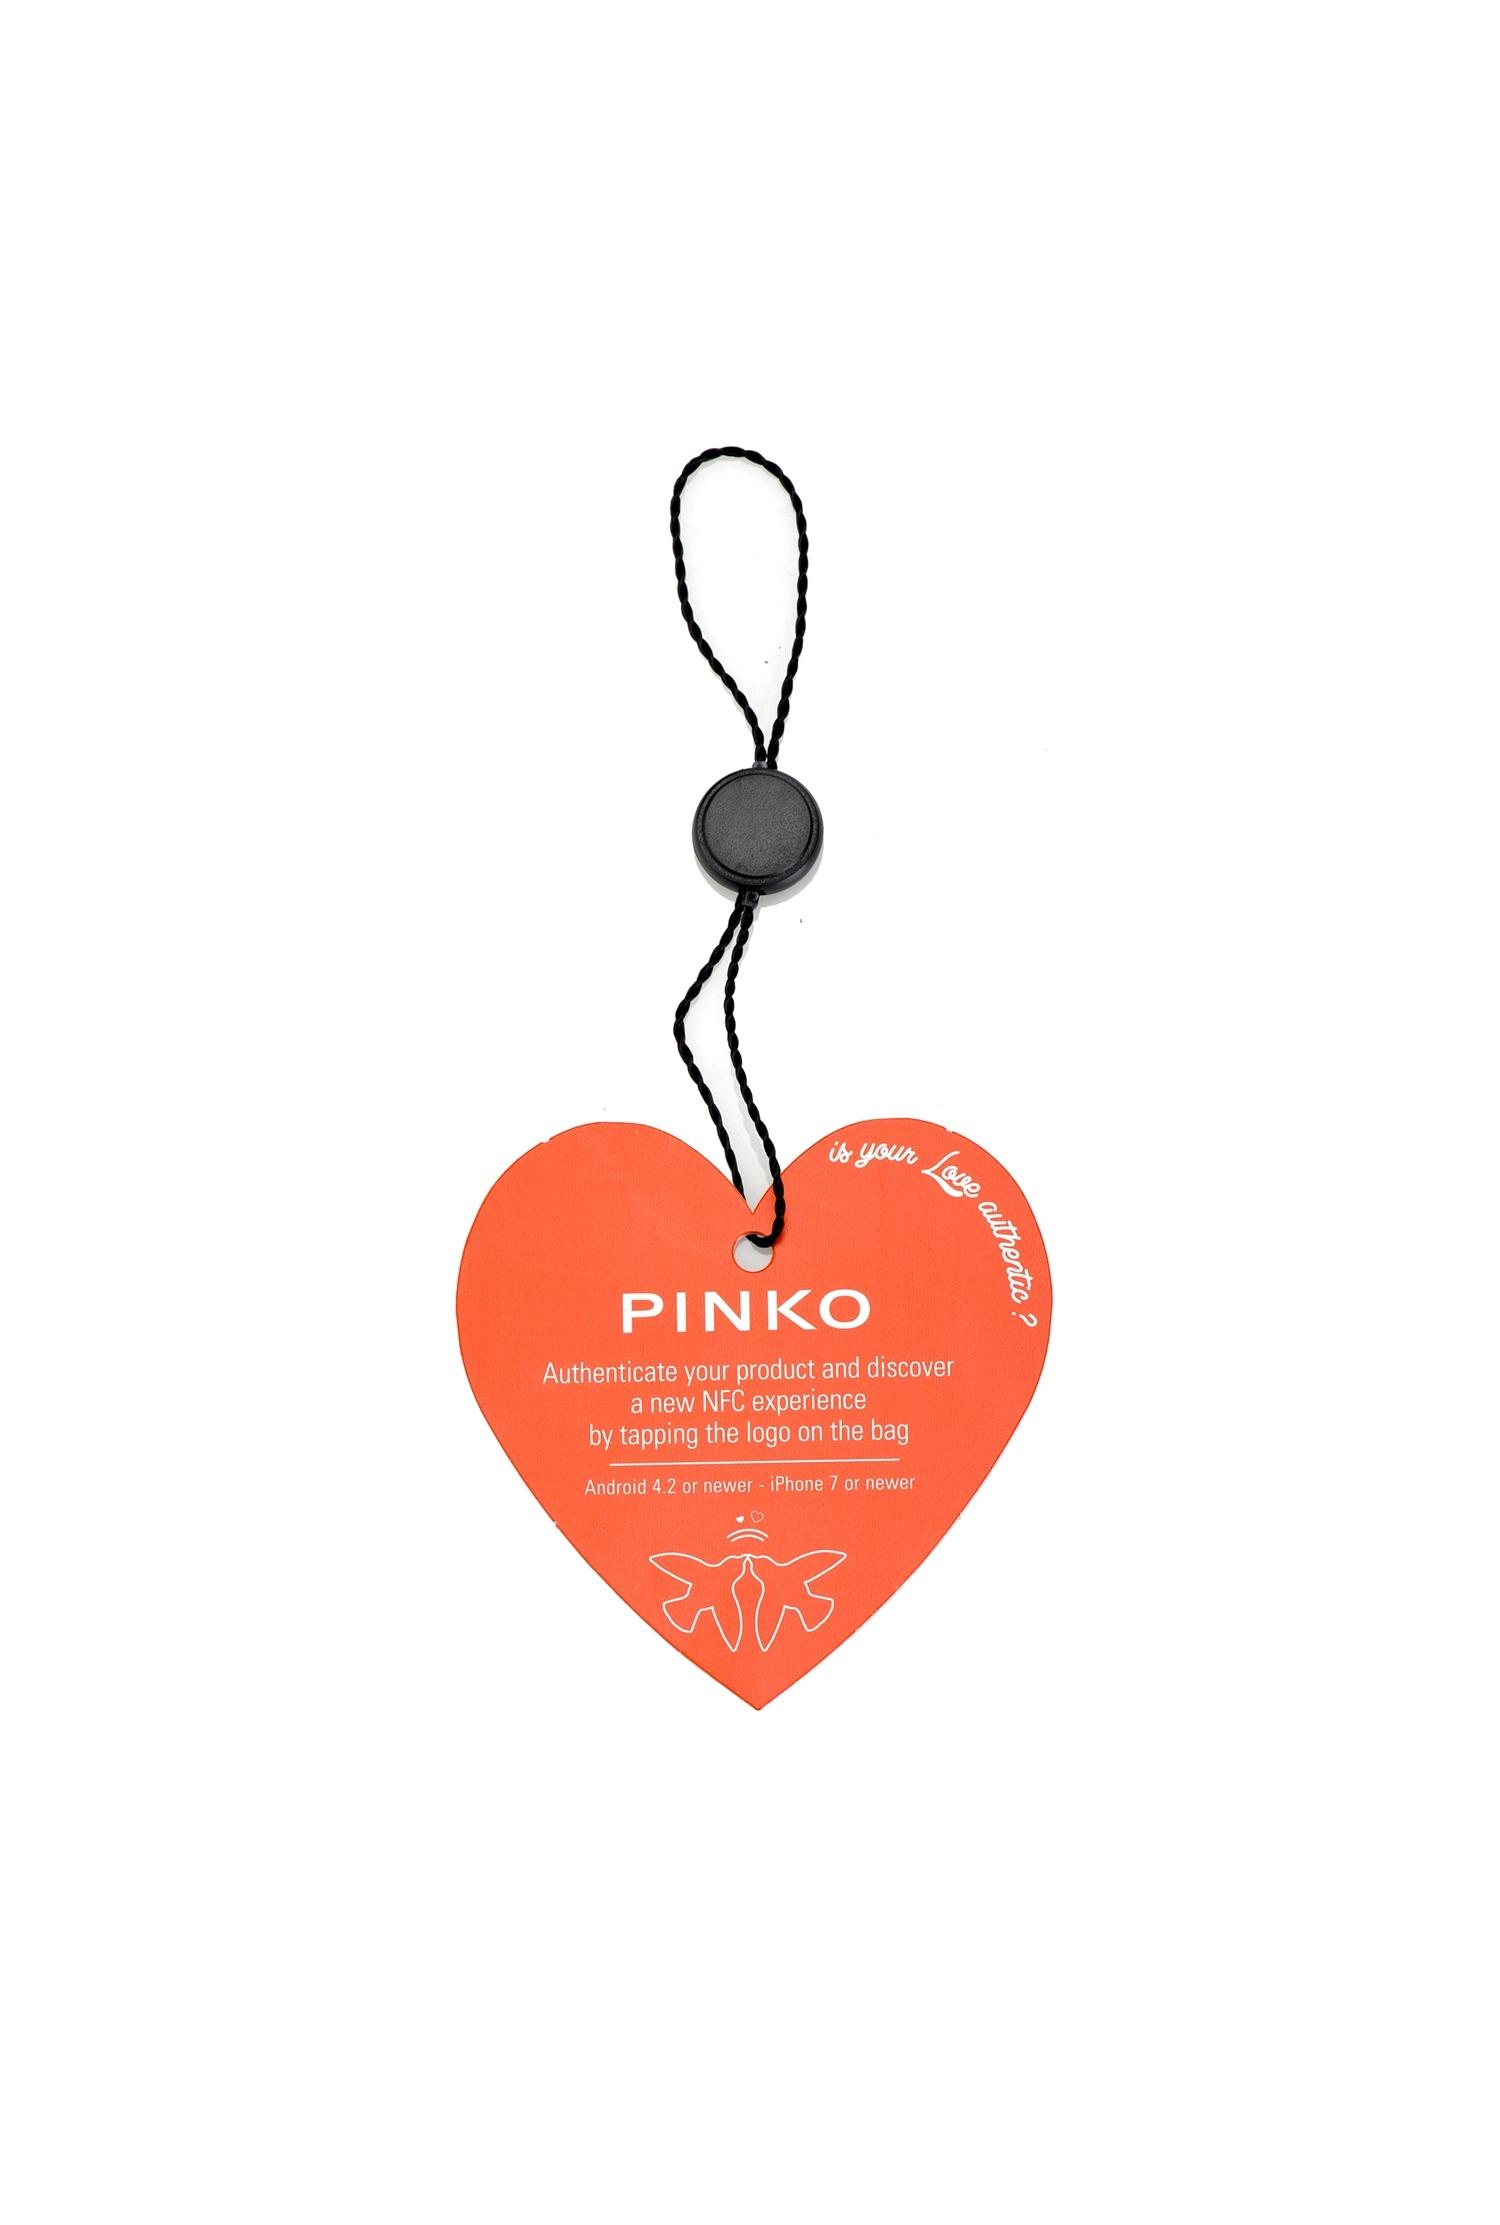 SHOPPING ON LINE PINKO BORSA MINI LOVE TWIST 1 SPALLACCIO+CATENA VITELLO VINTAGE FALL WINTER 19/20 NEW COLLECTION WOMEN'S